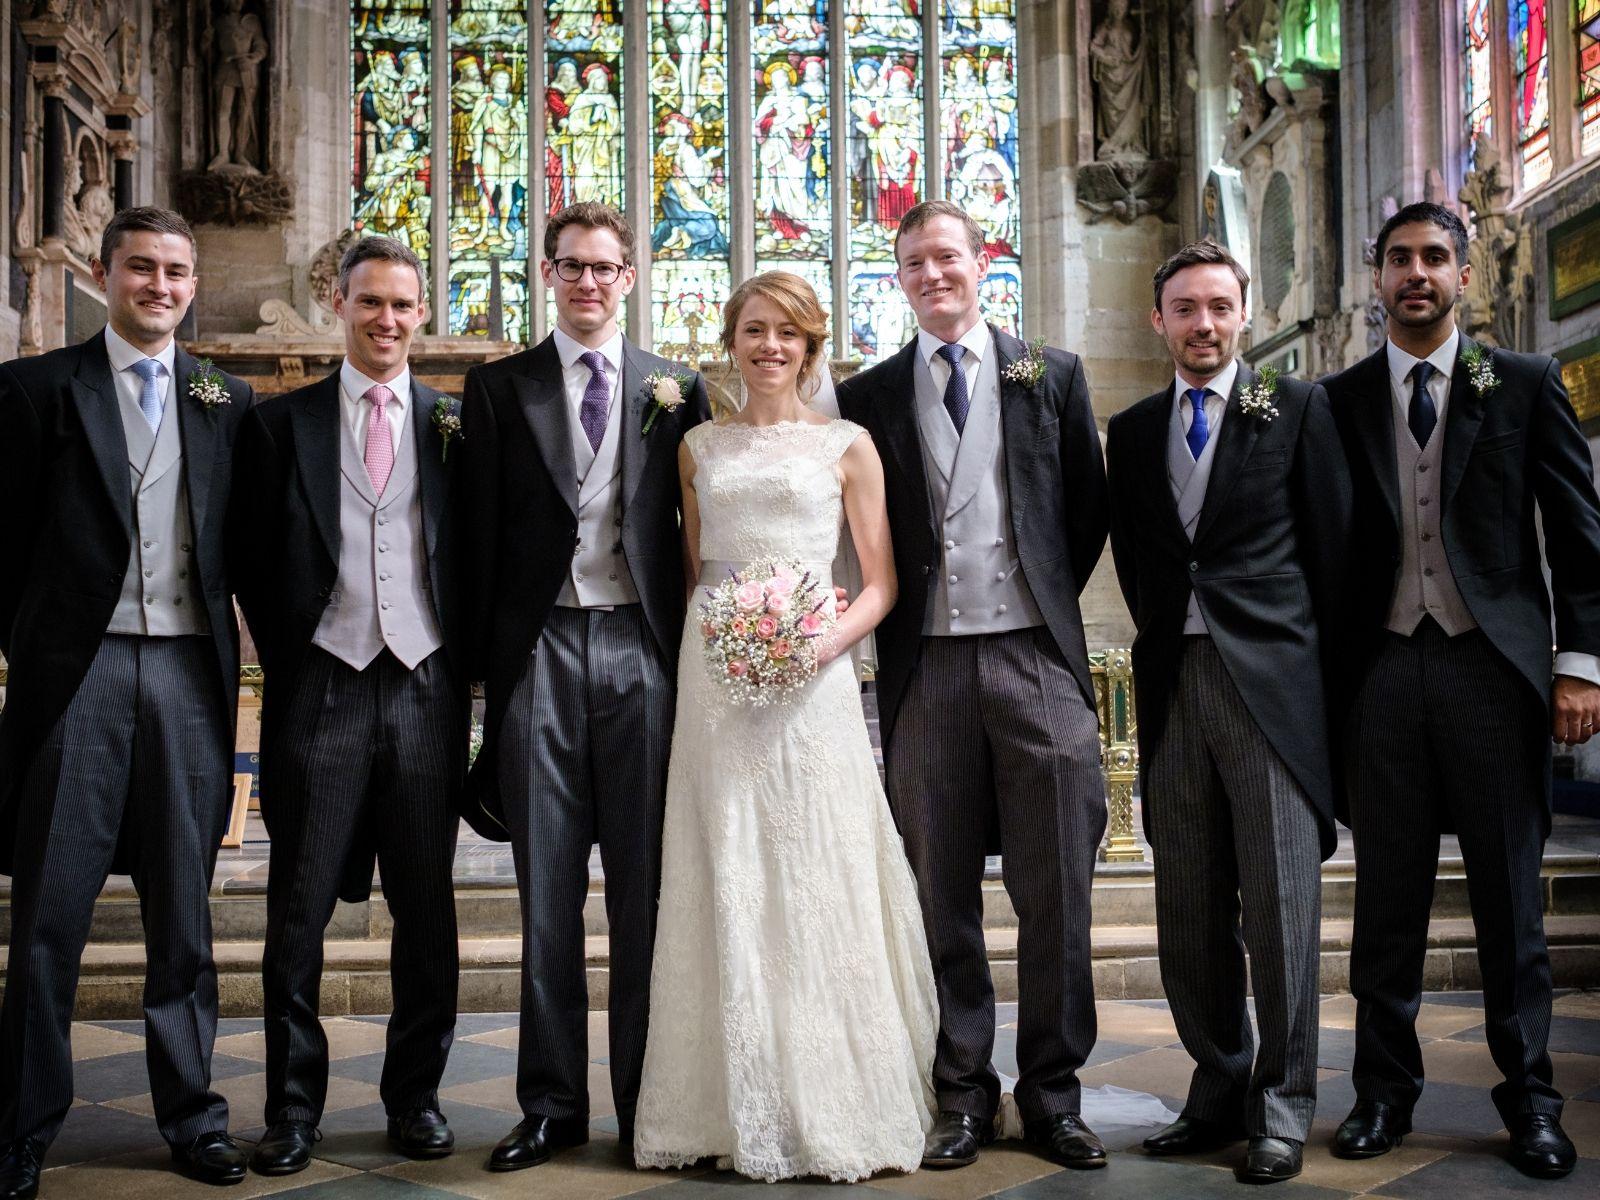 Boho Bride Harriet with her groomsmen at church wedding